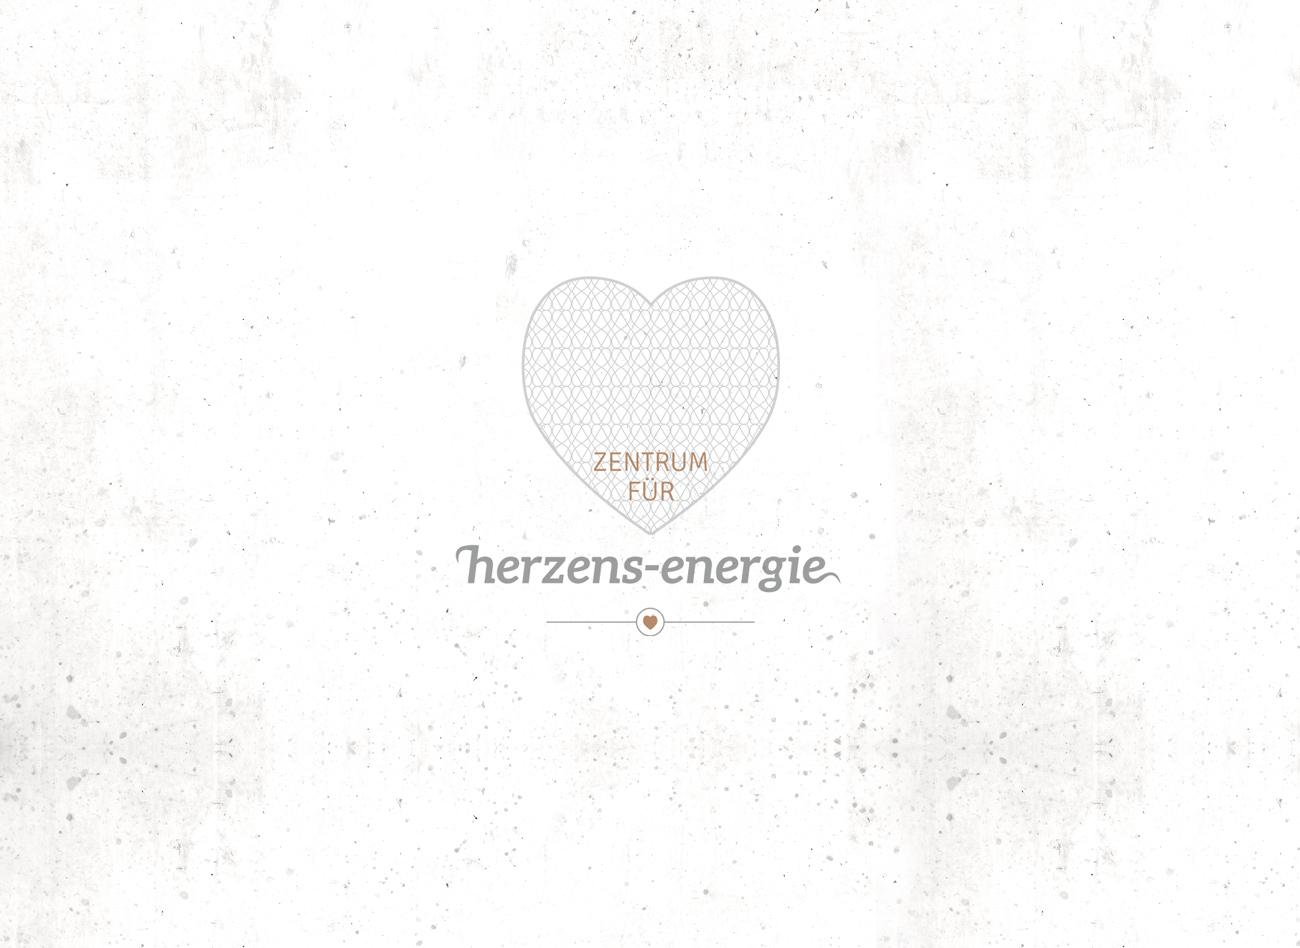 Logogestaltung / herzens-energie